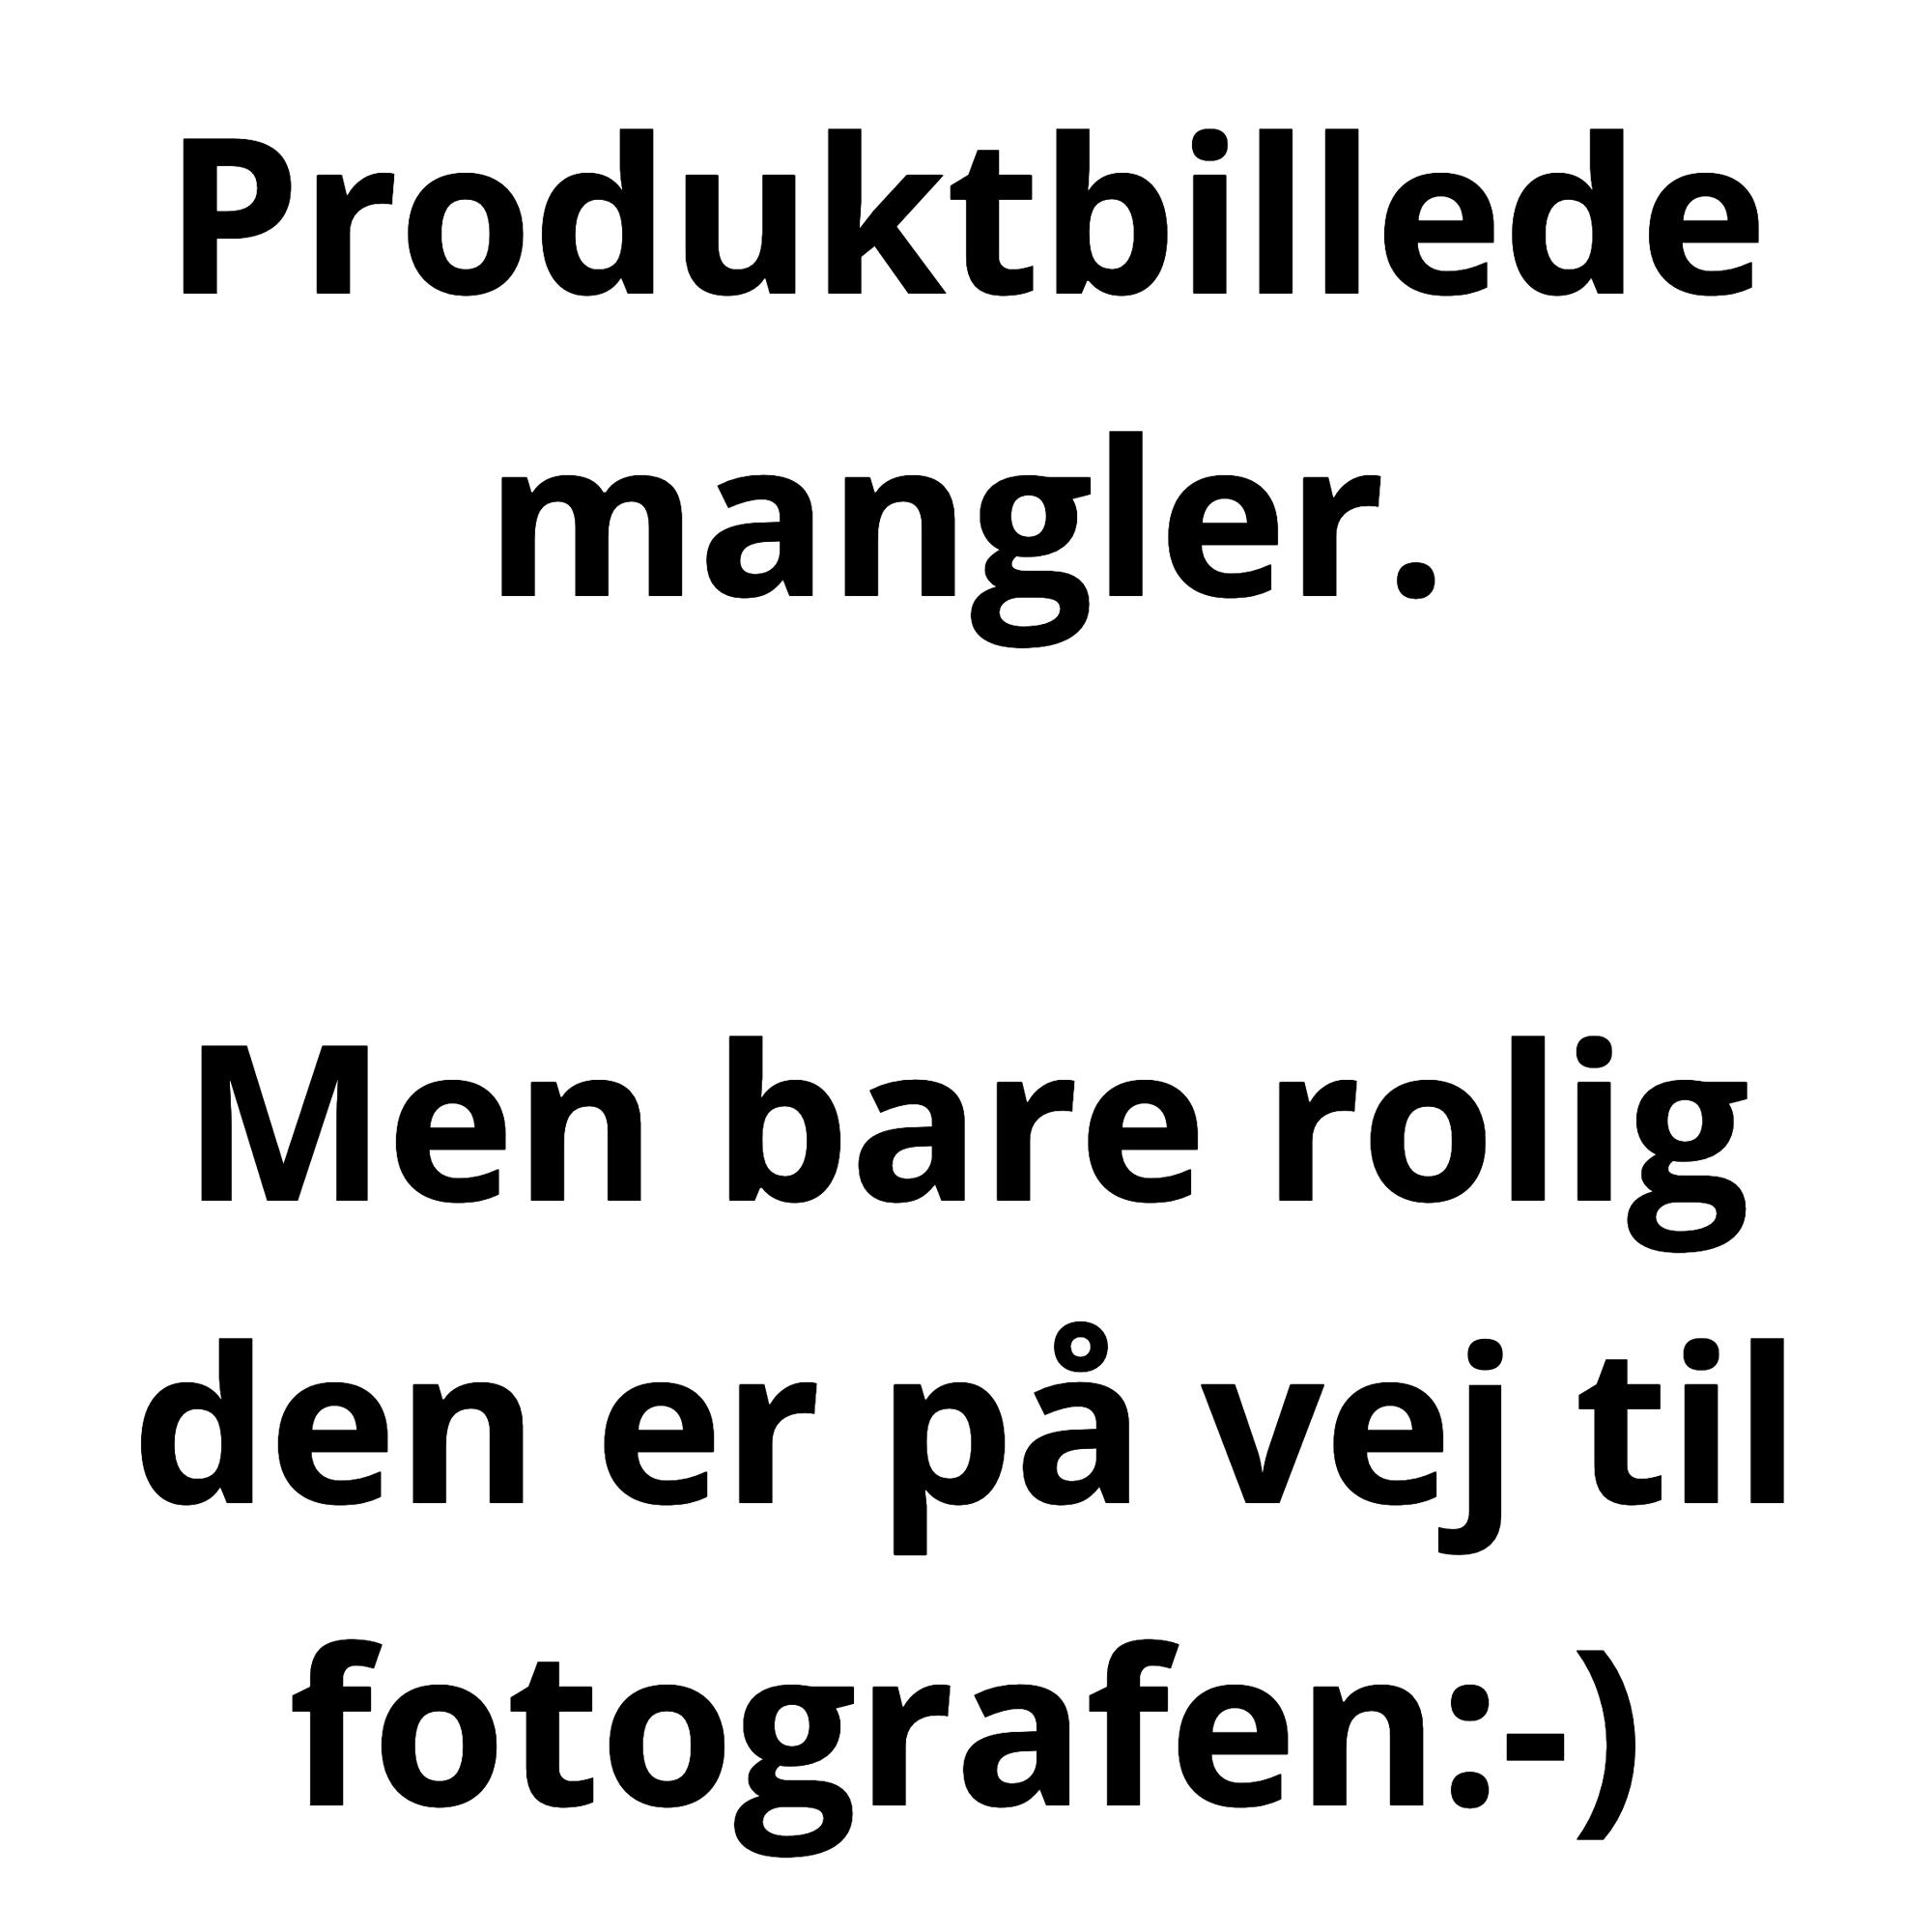 Brodit Passiv kabeltilslutnings holder lightning til 30 pin Apple iPhone 6 Plus/6S Plus/7 Plus/8 Plus/X/XR/Xs/Xs Max B:75-89 D:6-10 - 515667